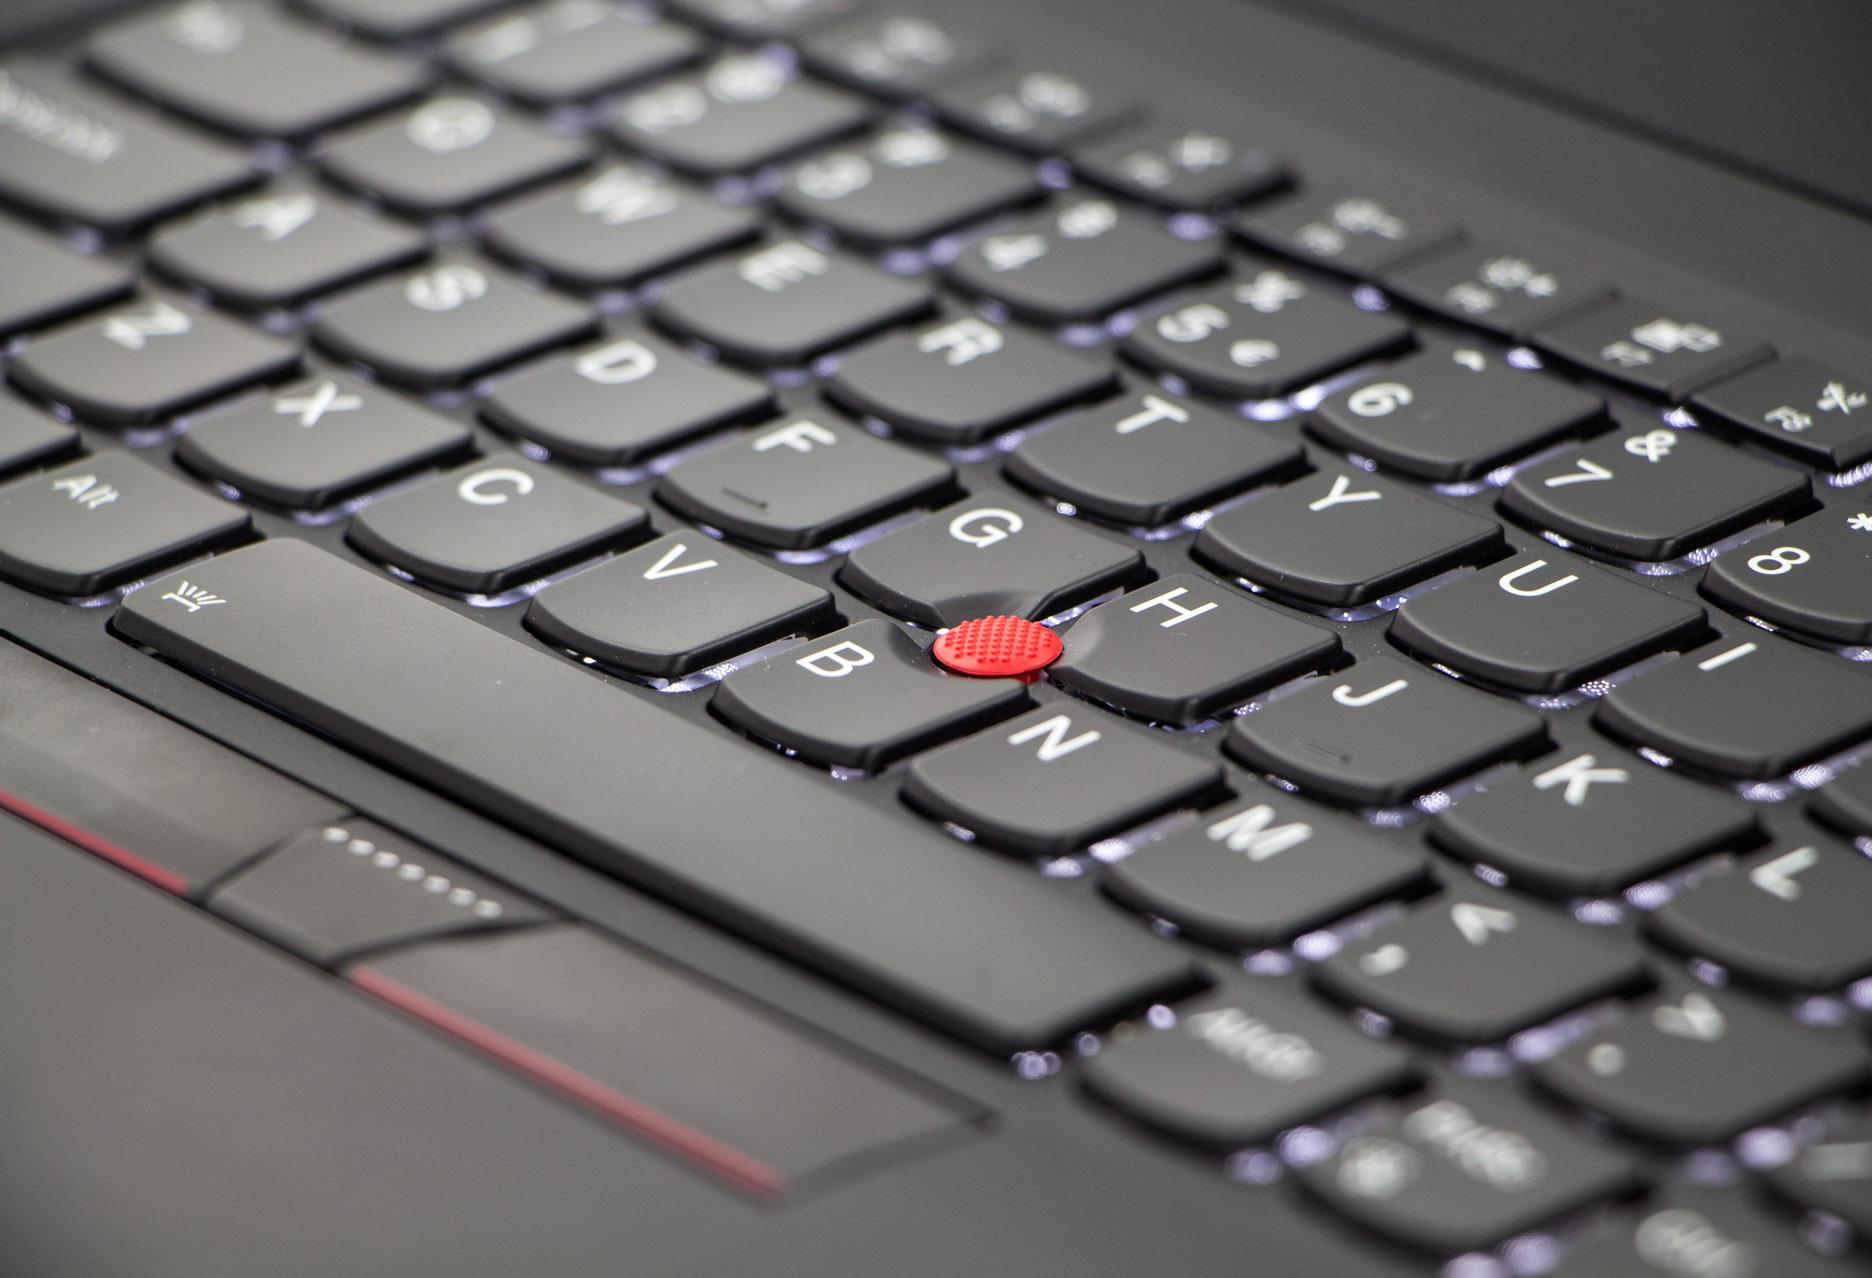 Lenovo ThinkPad X1 Carbon 5 trackpoint